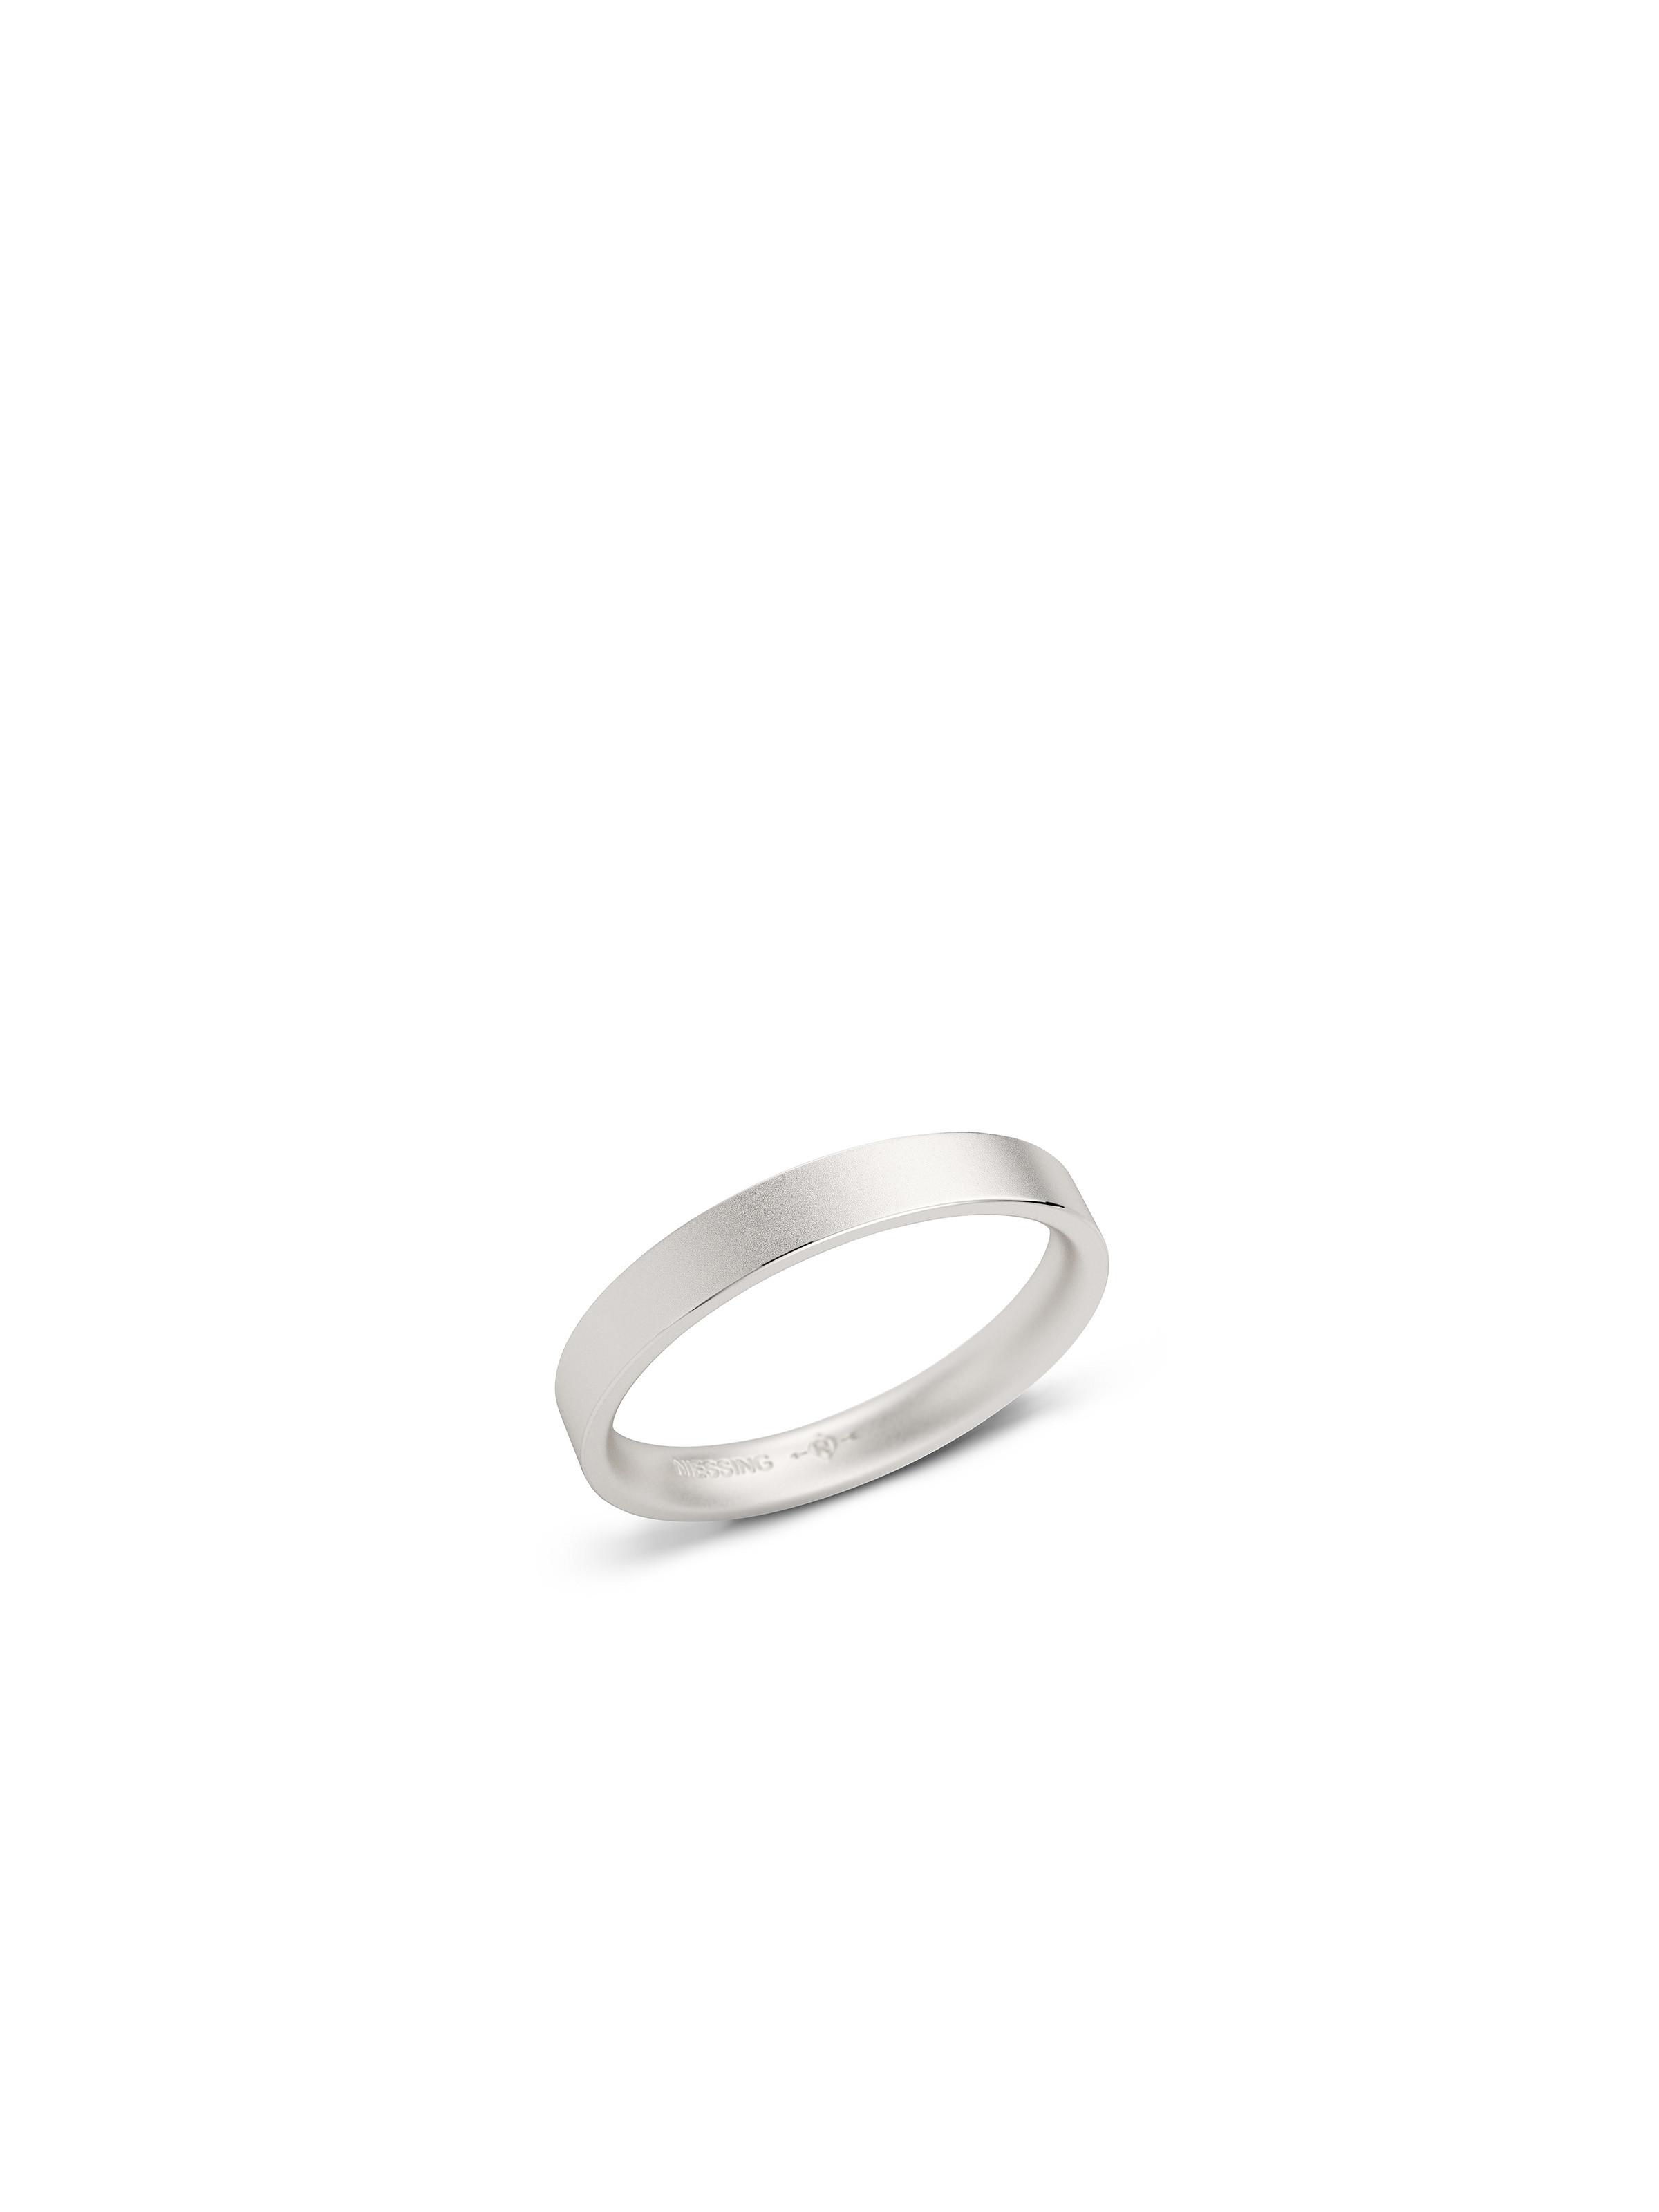 Cube wedding ring -rectangular/domed- with a fine-matt surface